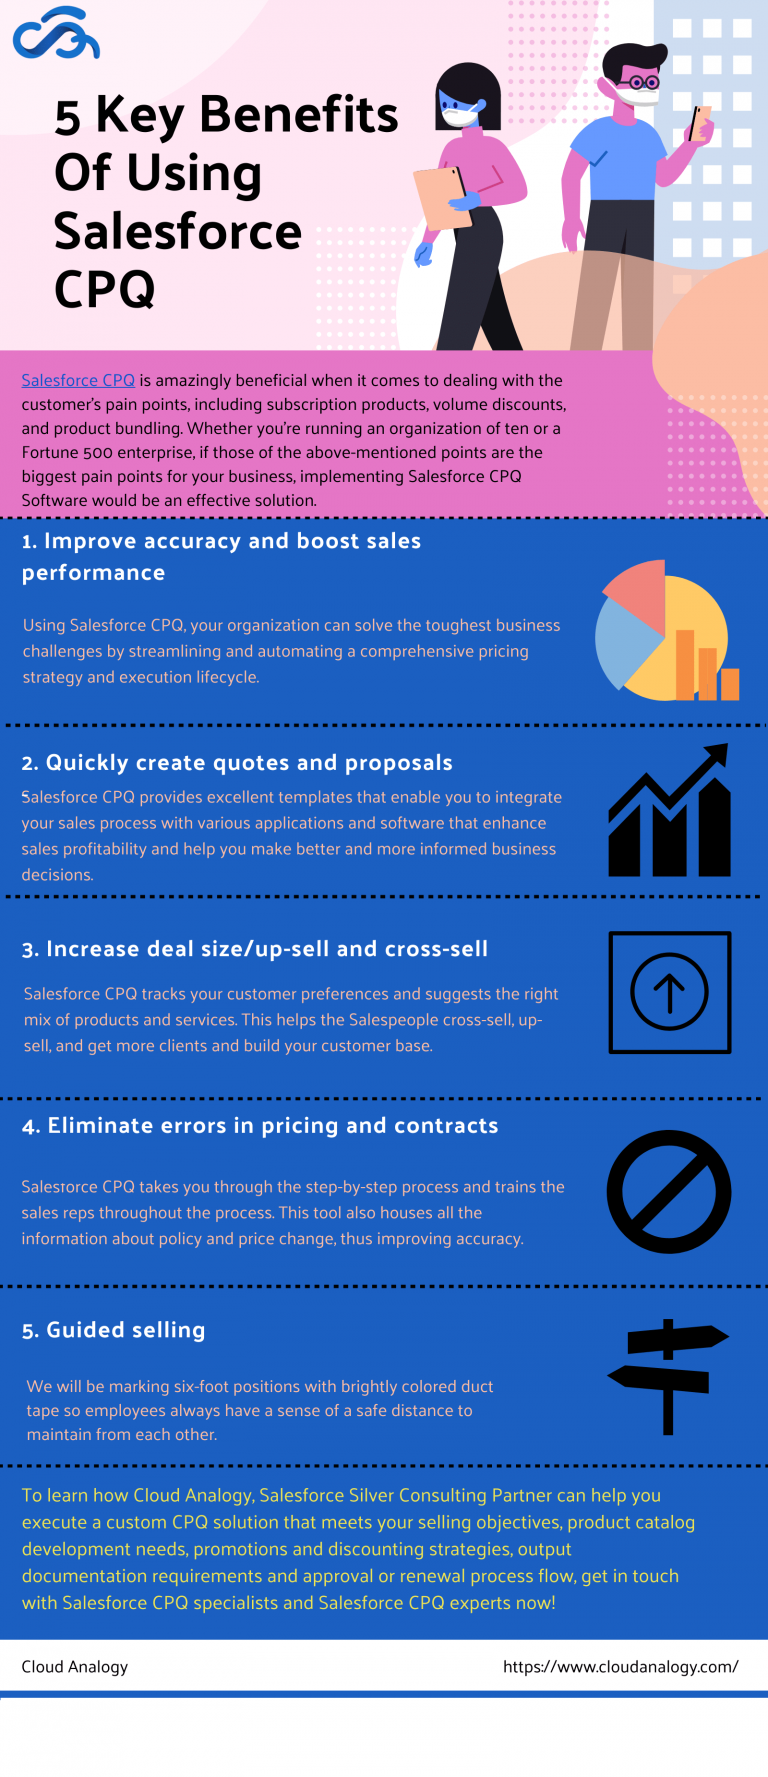 Benefits of using salesforce CPQ